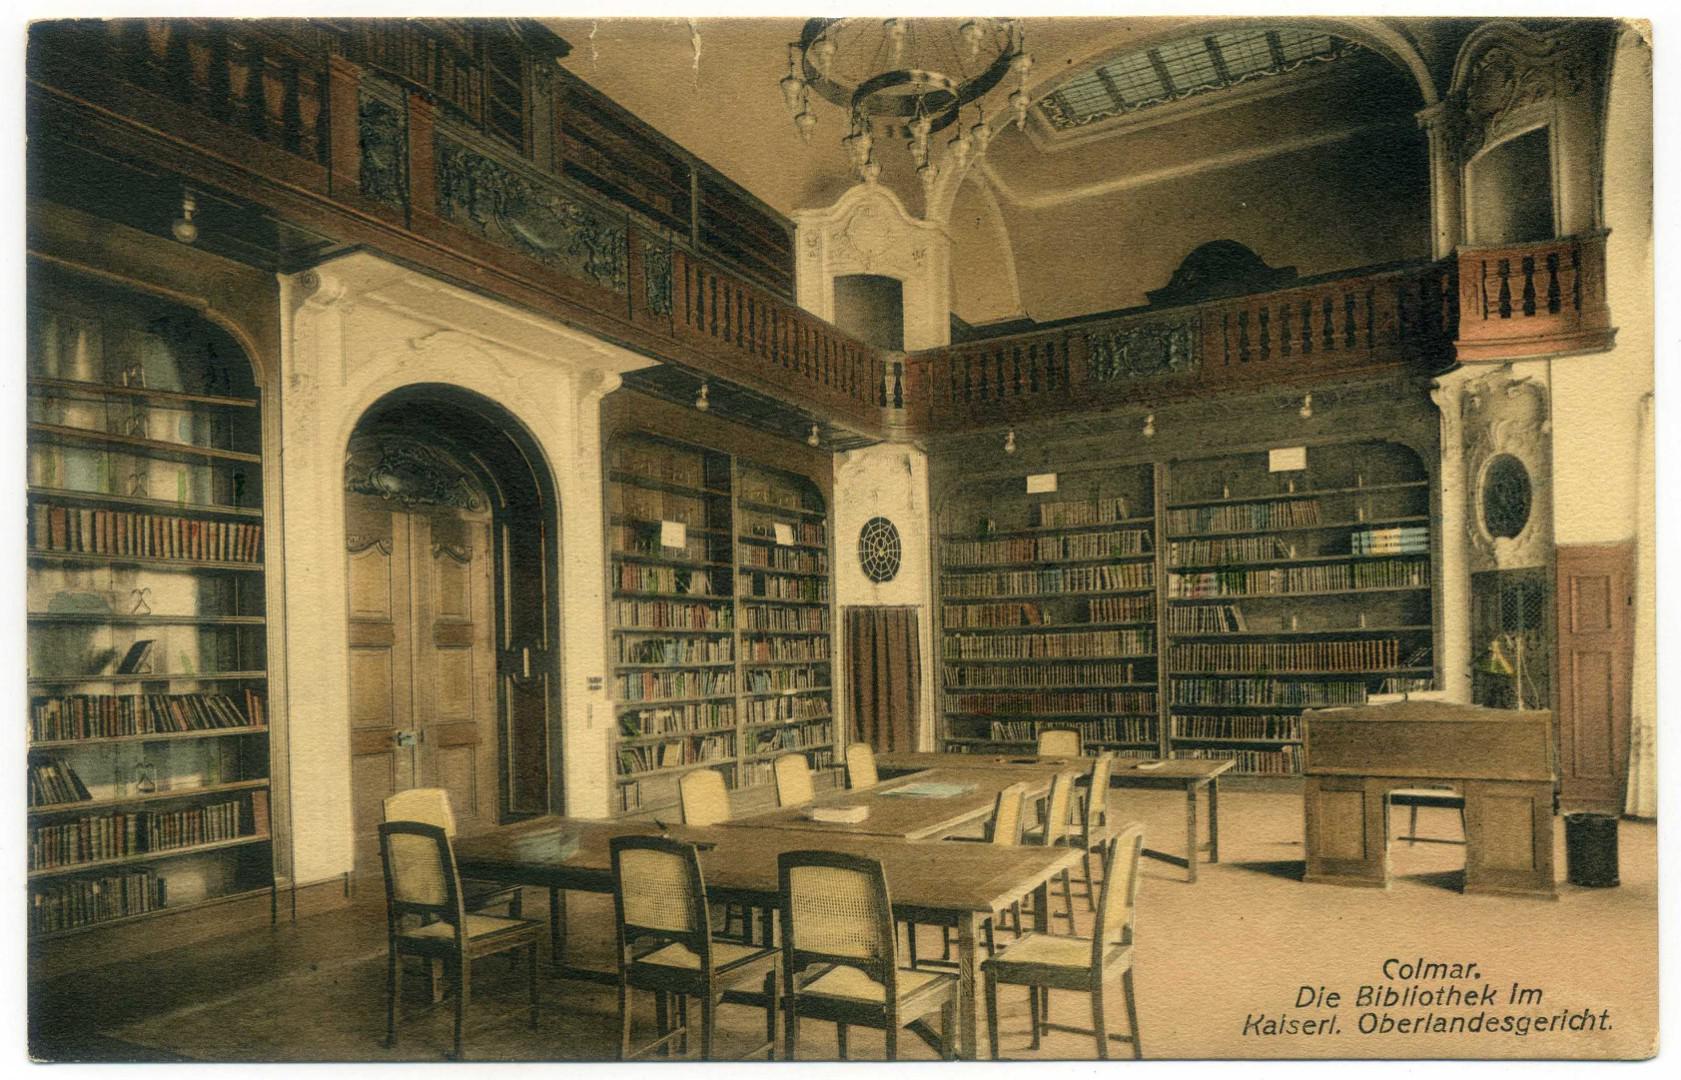 Colmar: Oberlandesgericht, Bibliothek